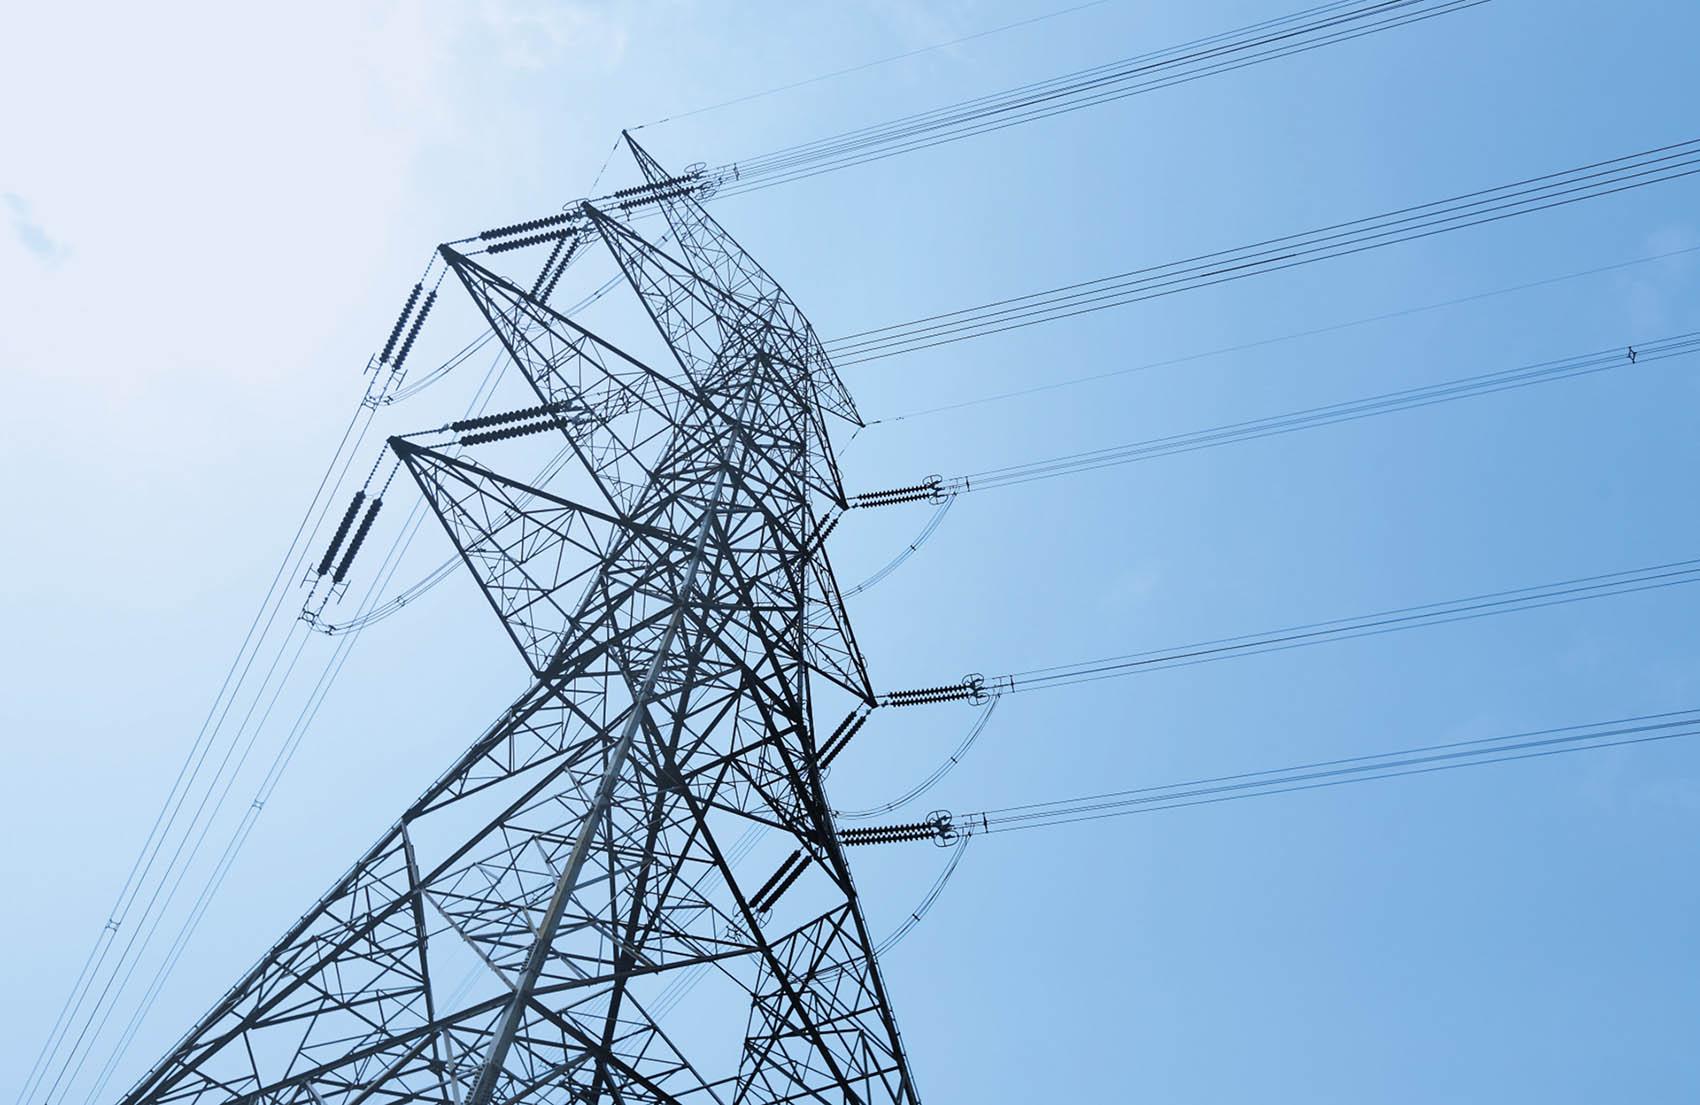 Sistemi di continuità per imprese distribuzione elettrica